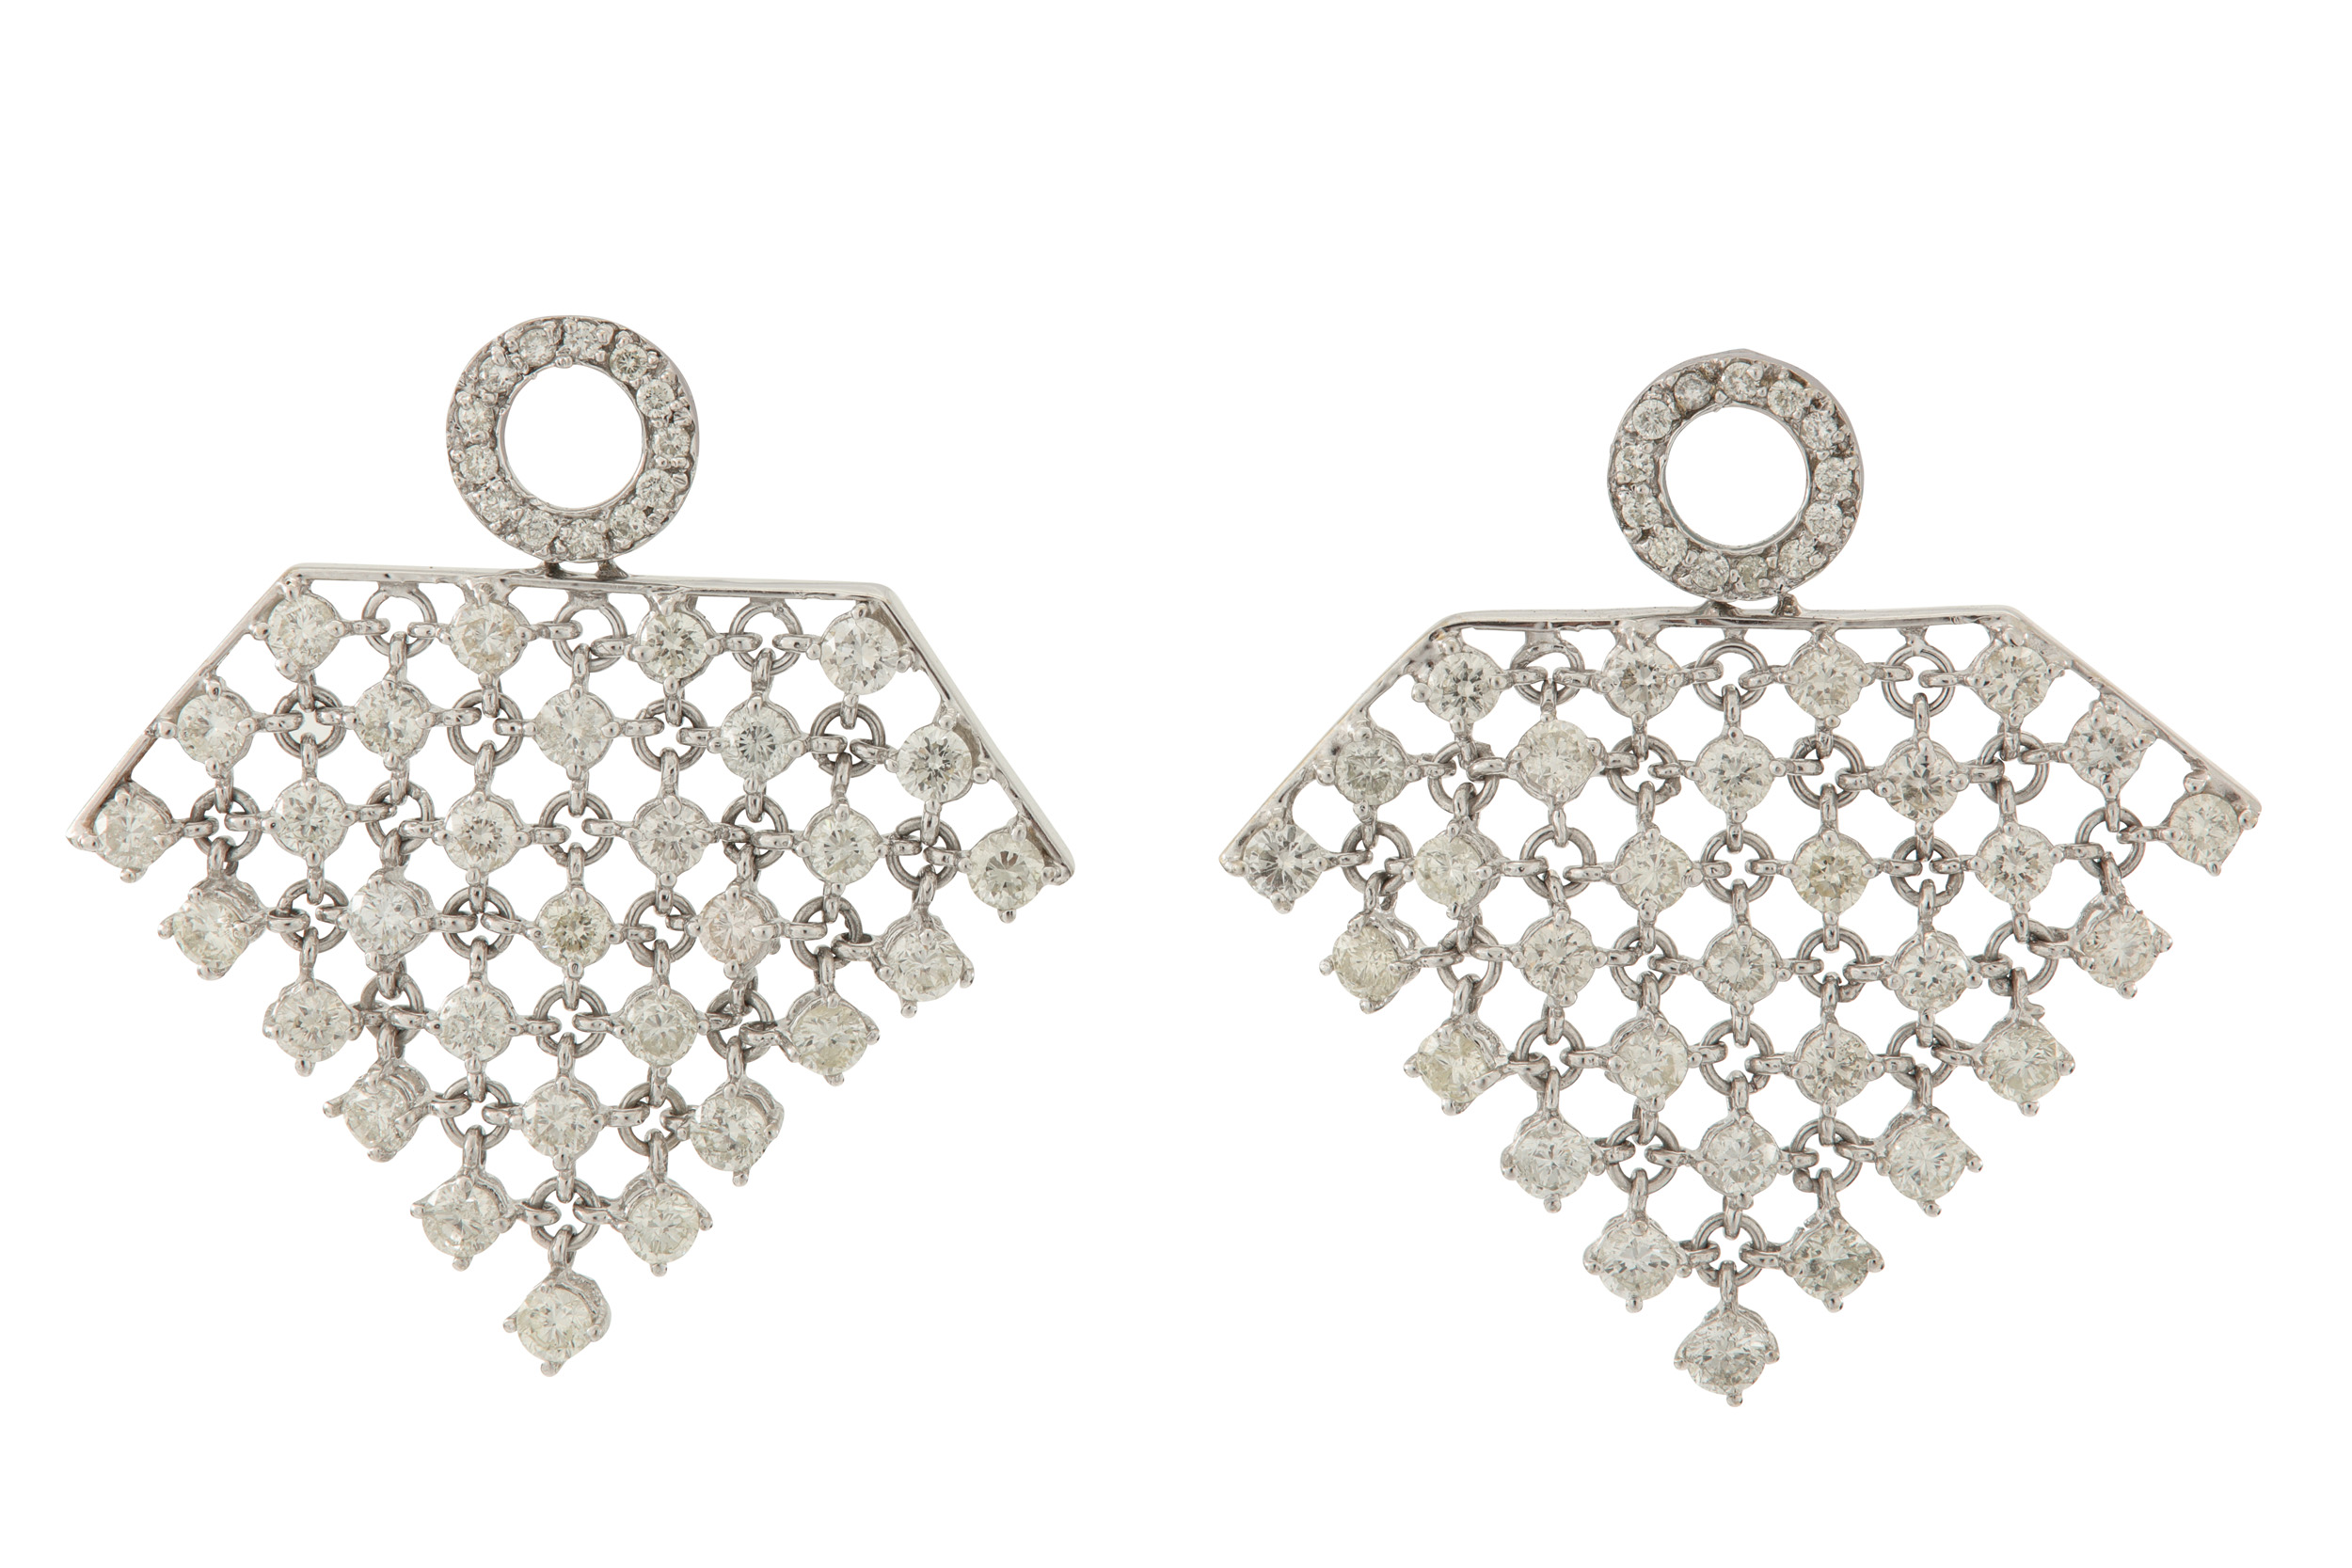 Lot 13 - A pair of diamond earrings